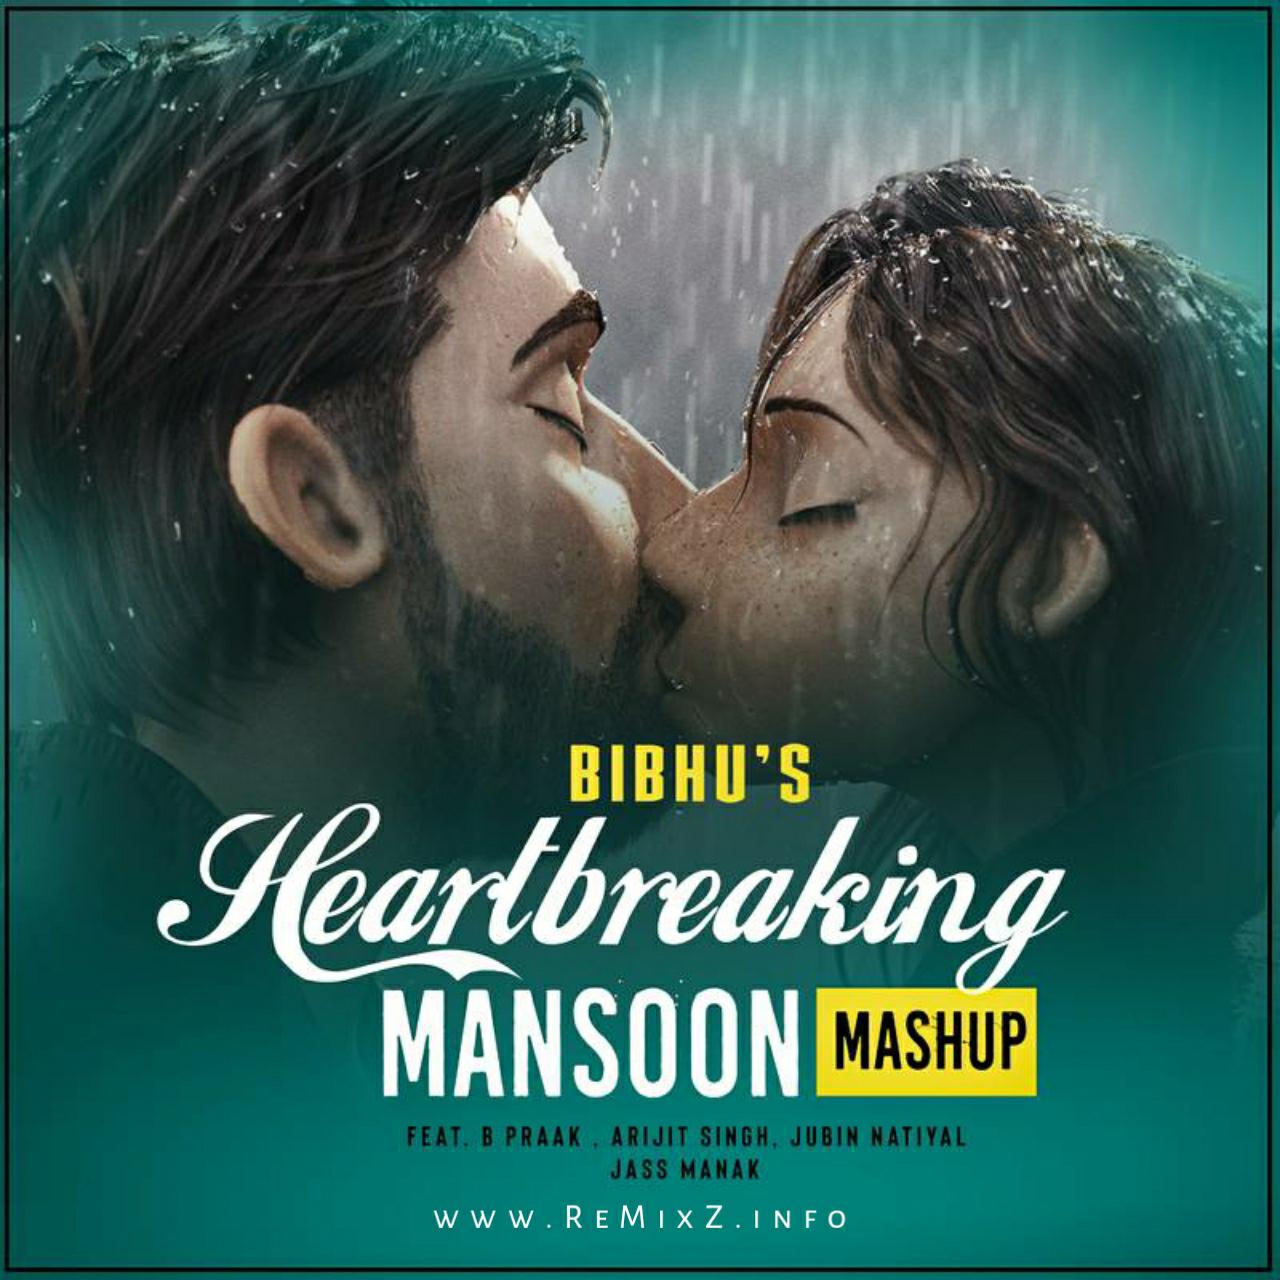 hearbreak-monsoon-mashup-2020-dj-bibhu.jpg